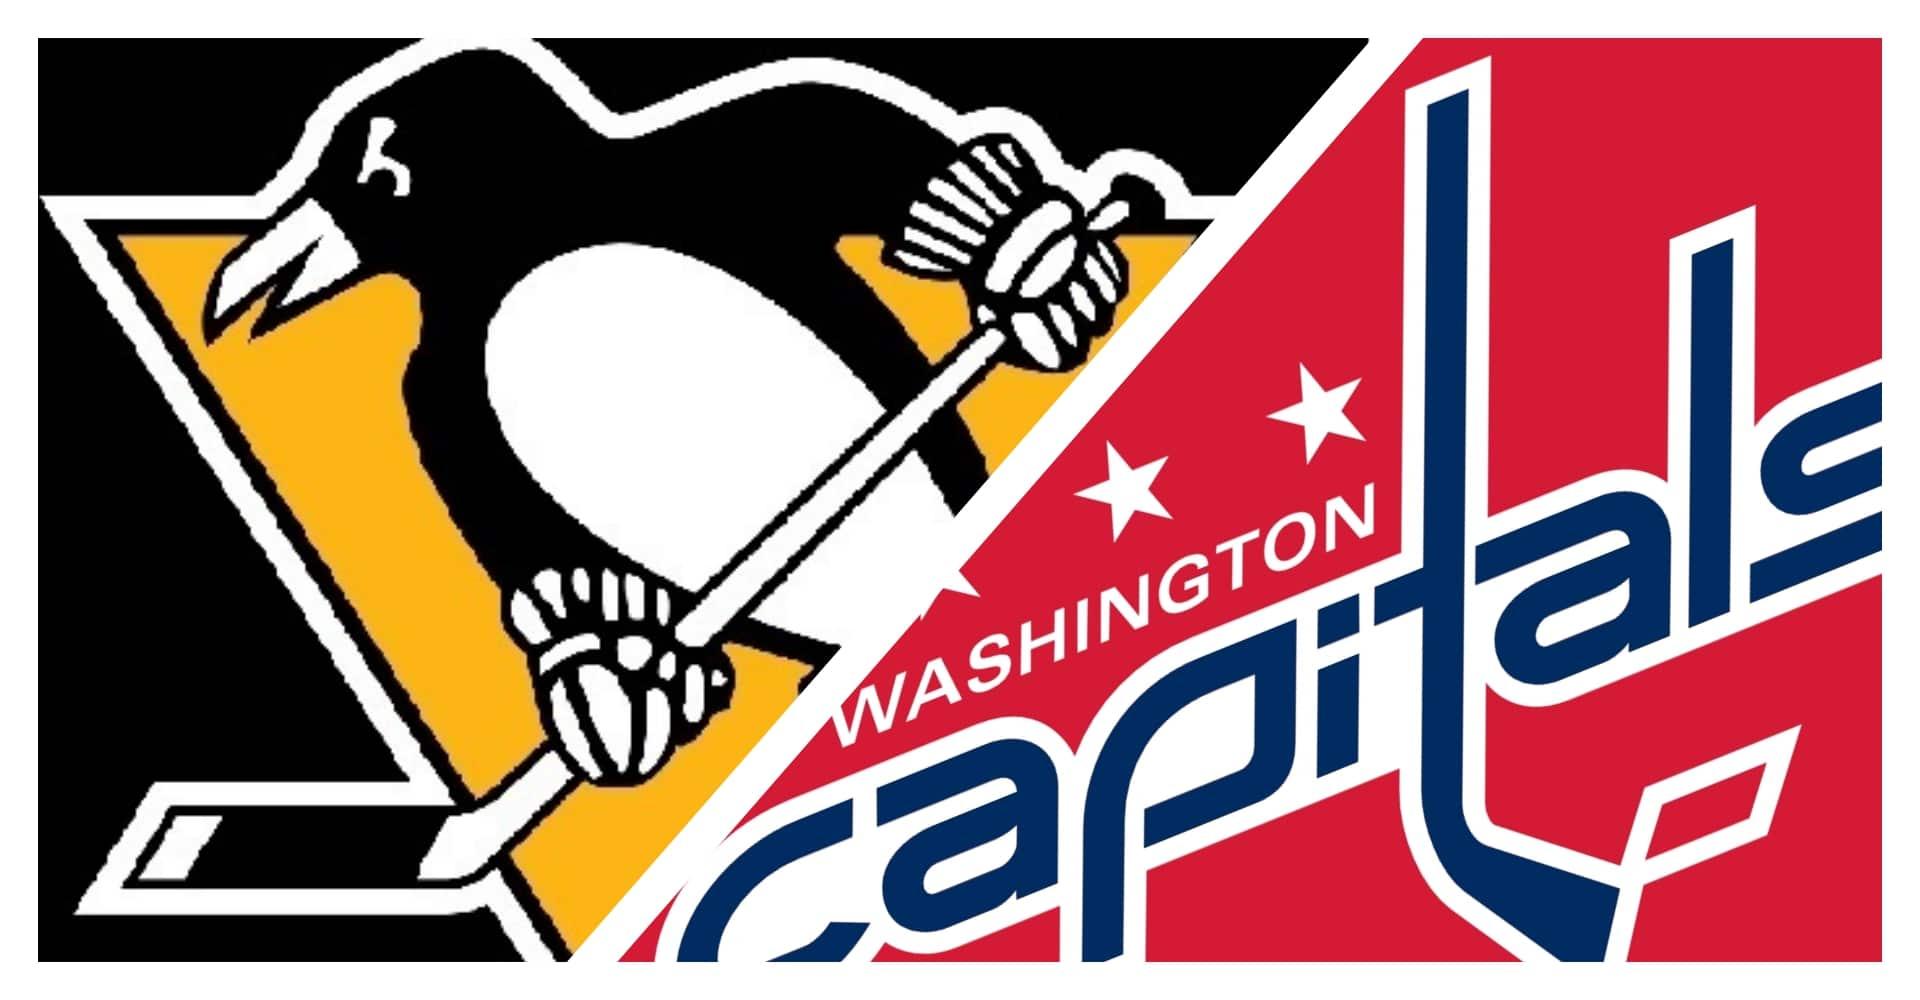 Pittsburgh Penguins vs. Washington Capitals